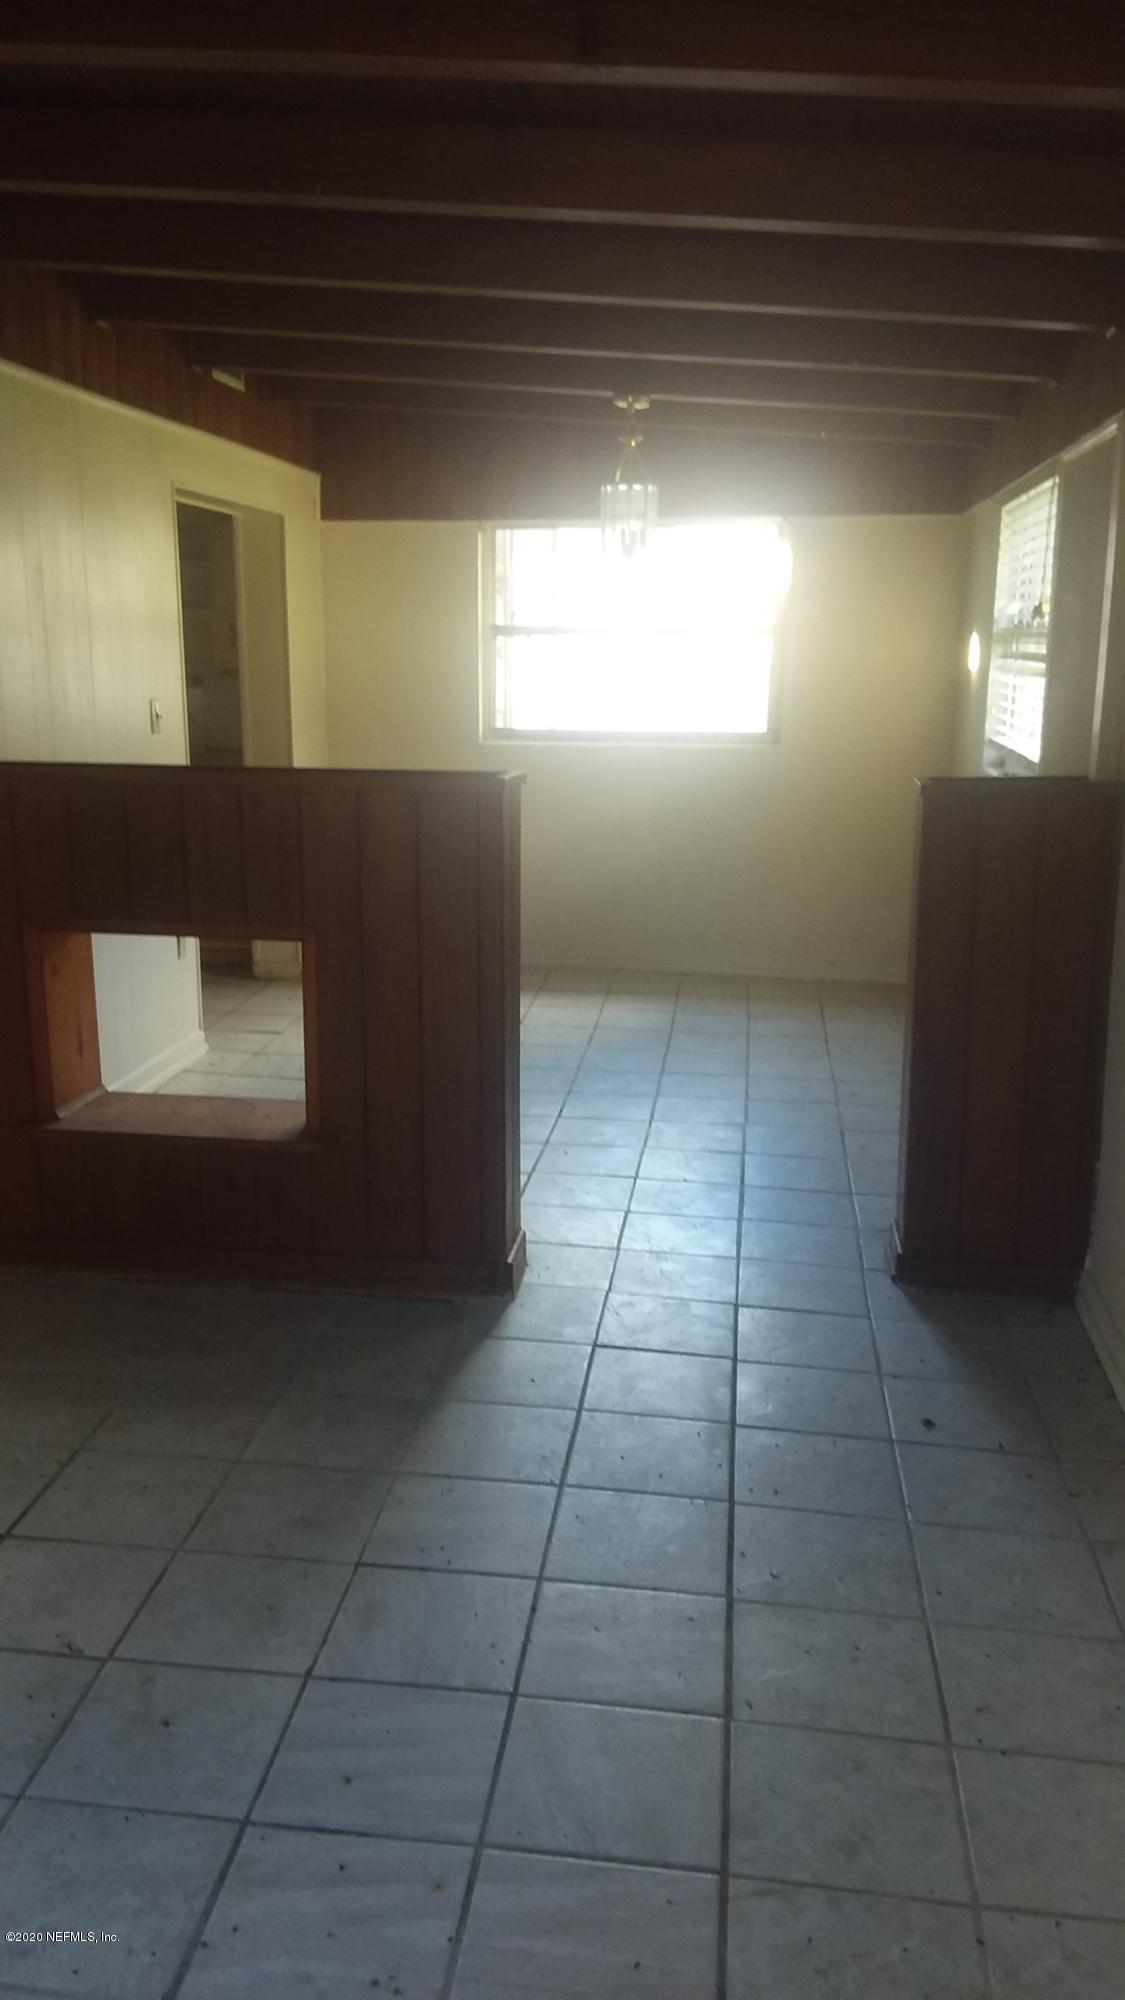 14118 180TH, CROSS CREEK, FLORIDA 32640, 3 Bedrooms Bedrooms, ,2 BathroomsBathrooms,Residential,For sale,180TH,1039609